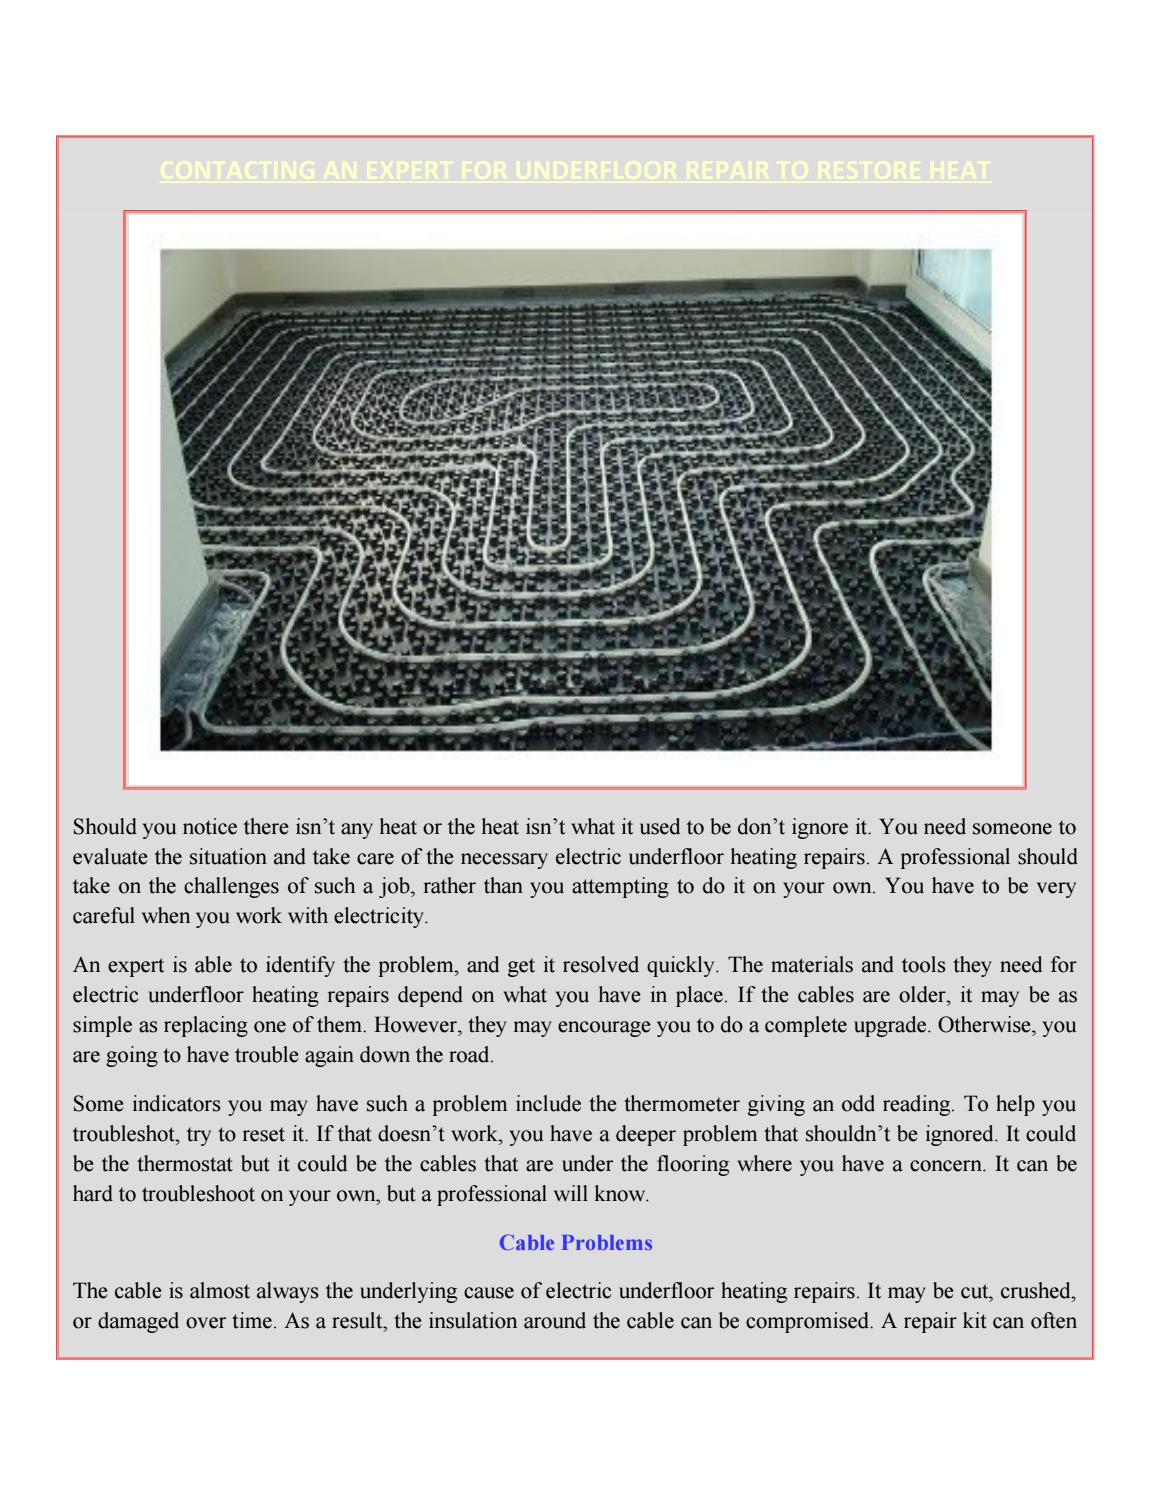 Contacting An Expert For Underfloor Repair To Restore Heat By Dkp